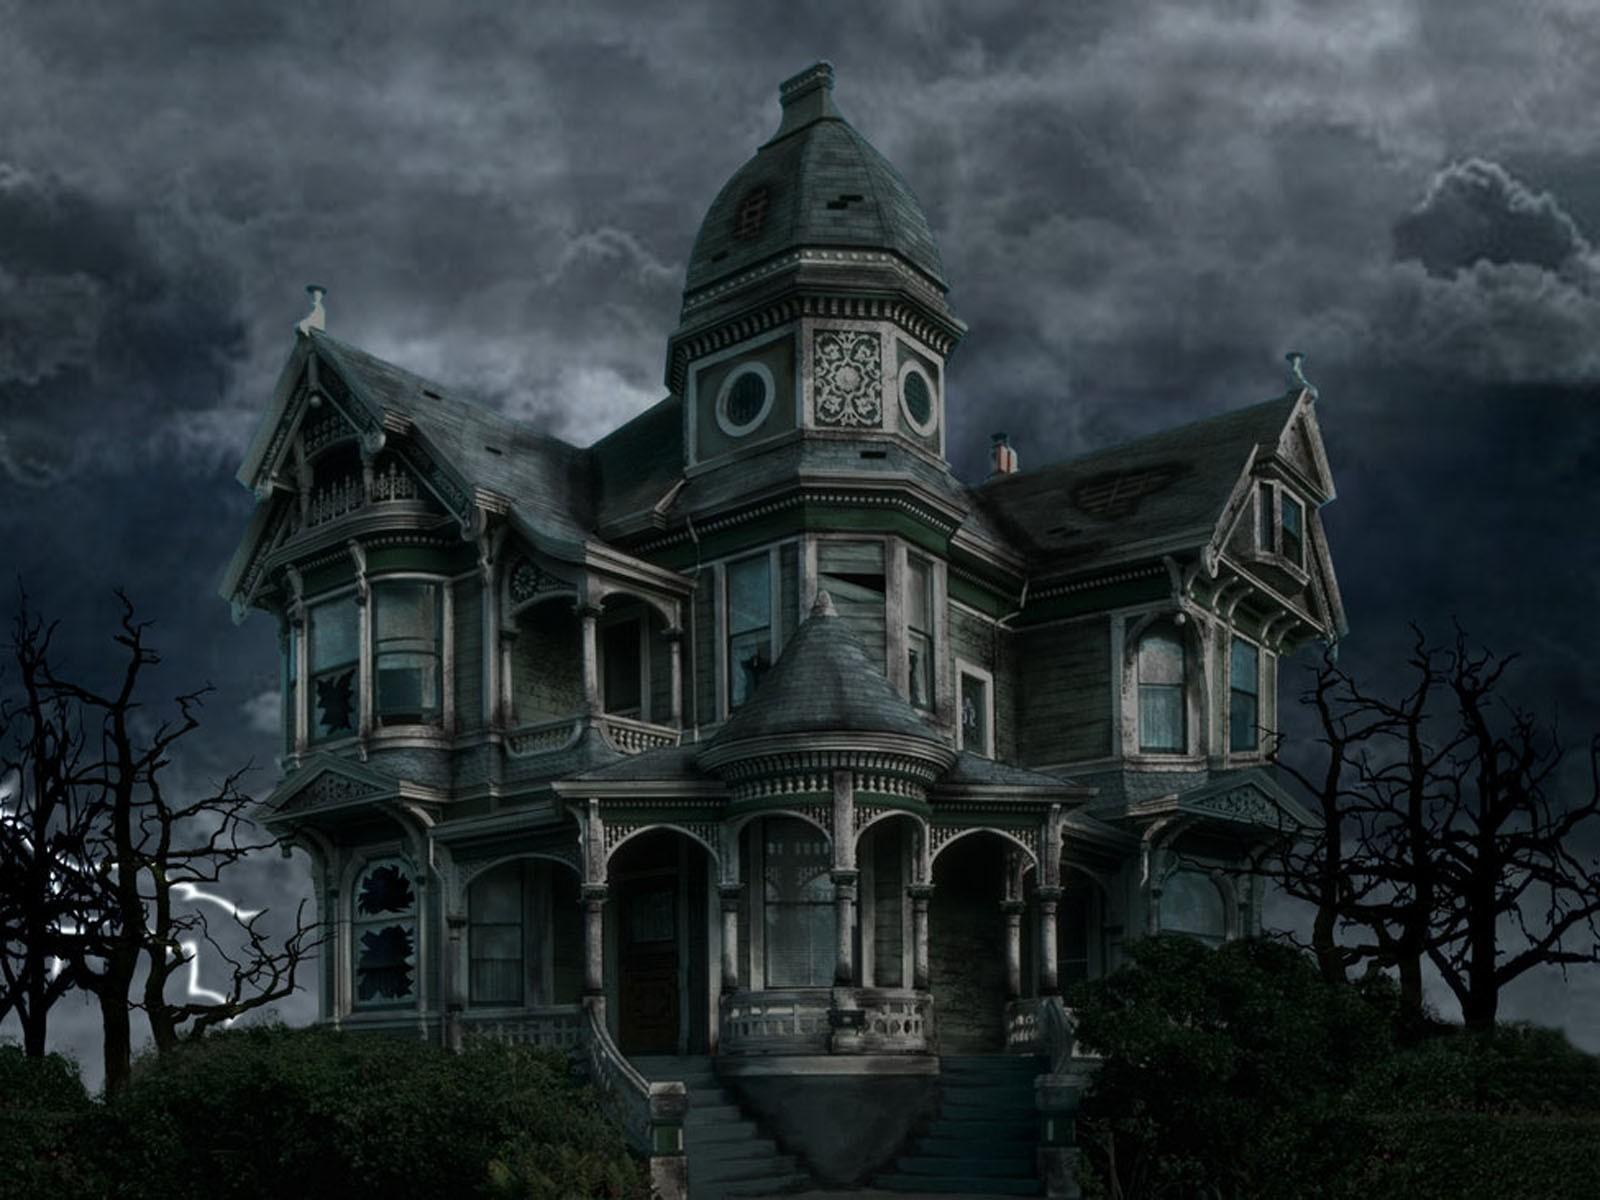 Fantasy Art Night Building House Church Gothic Architecture Estate Darkness Landmark Mansion Facade Screenshot 1600x1200 Px